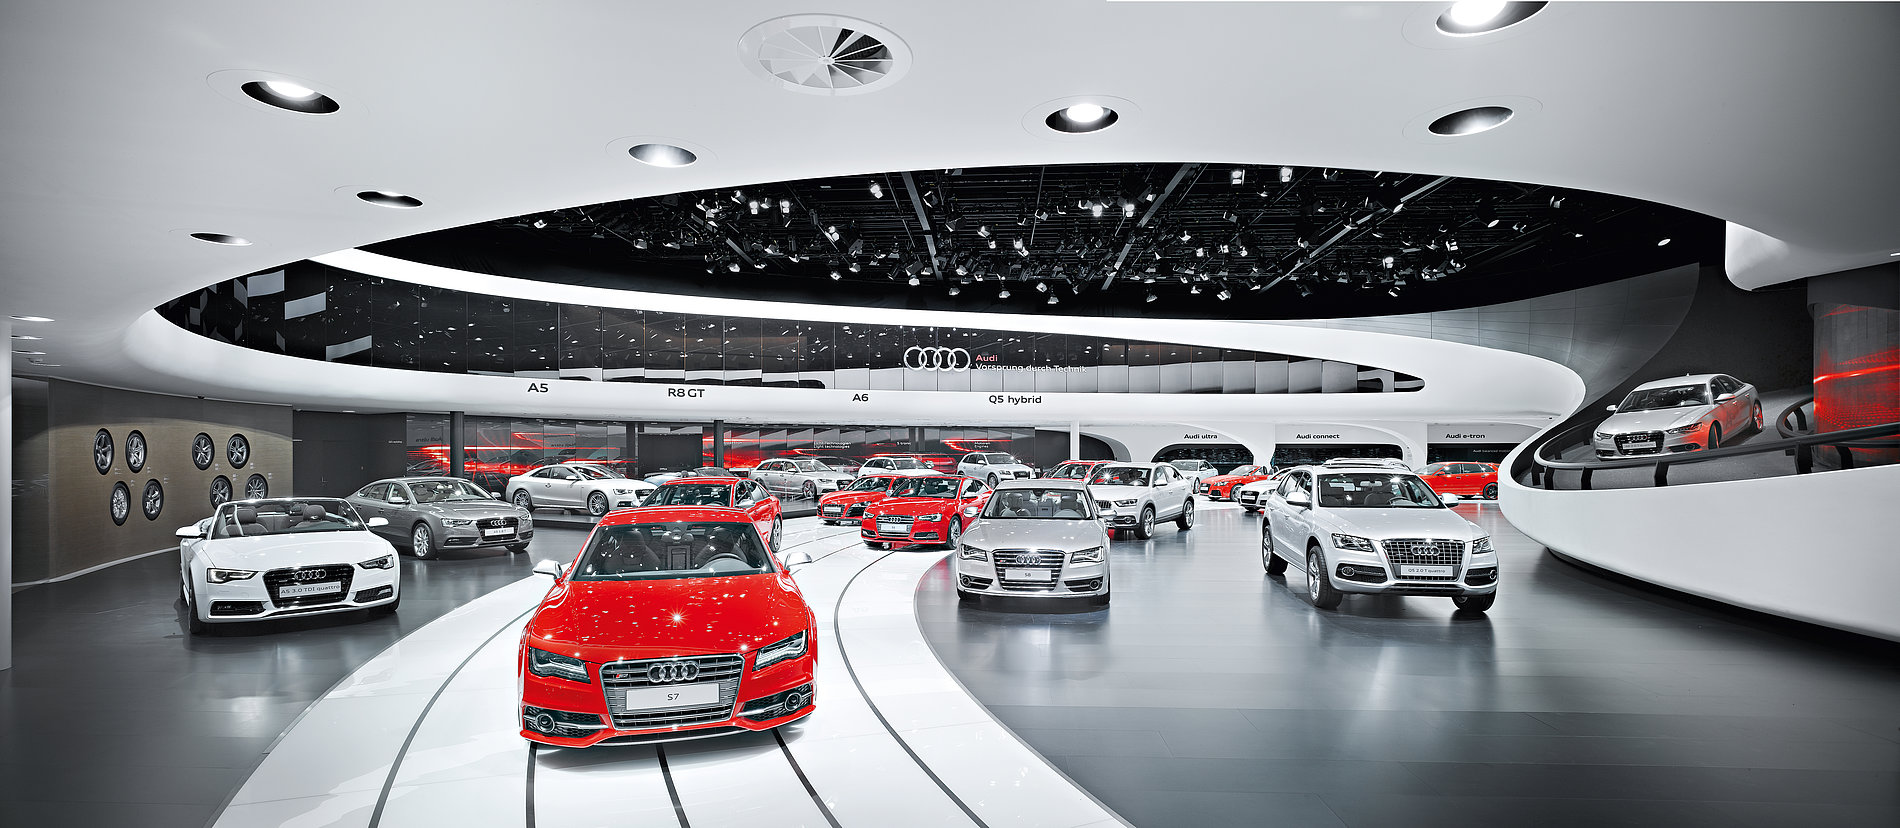 The Audi Ring –  Brand Pavilion IAA 2011 | Red Dot Design Award